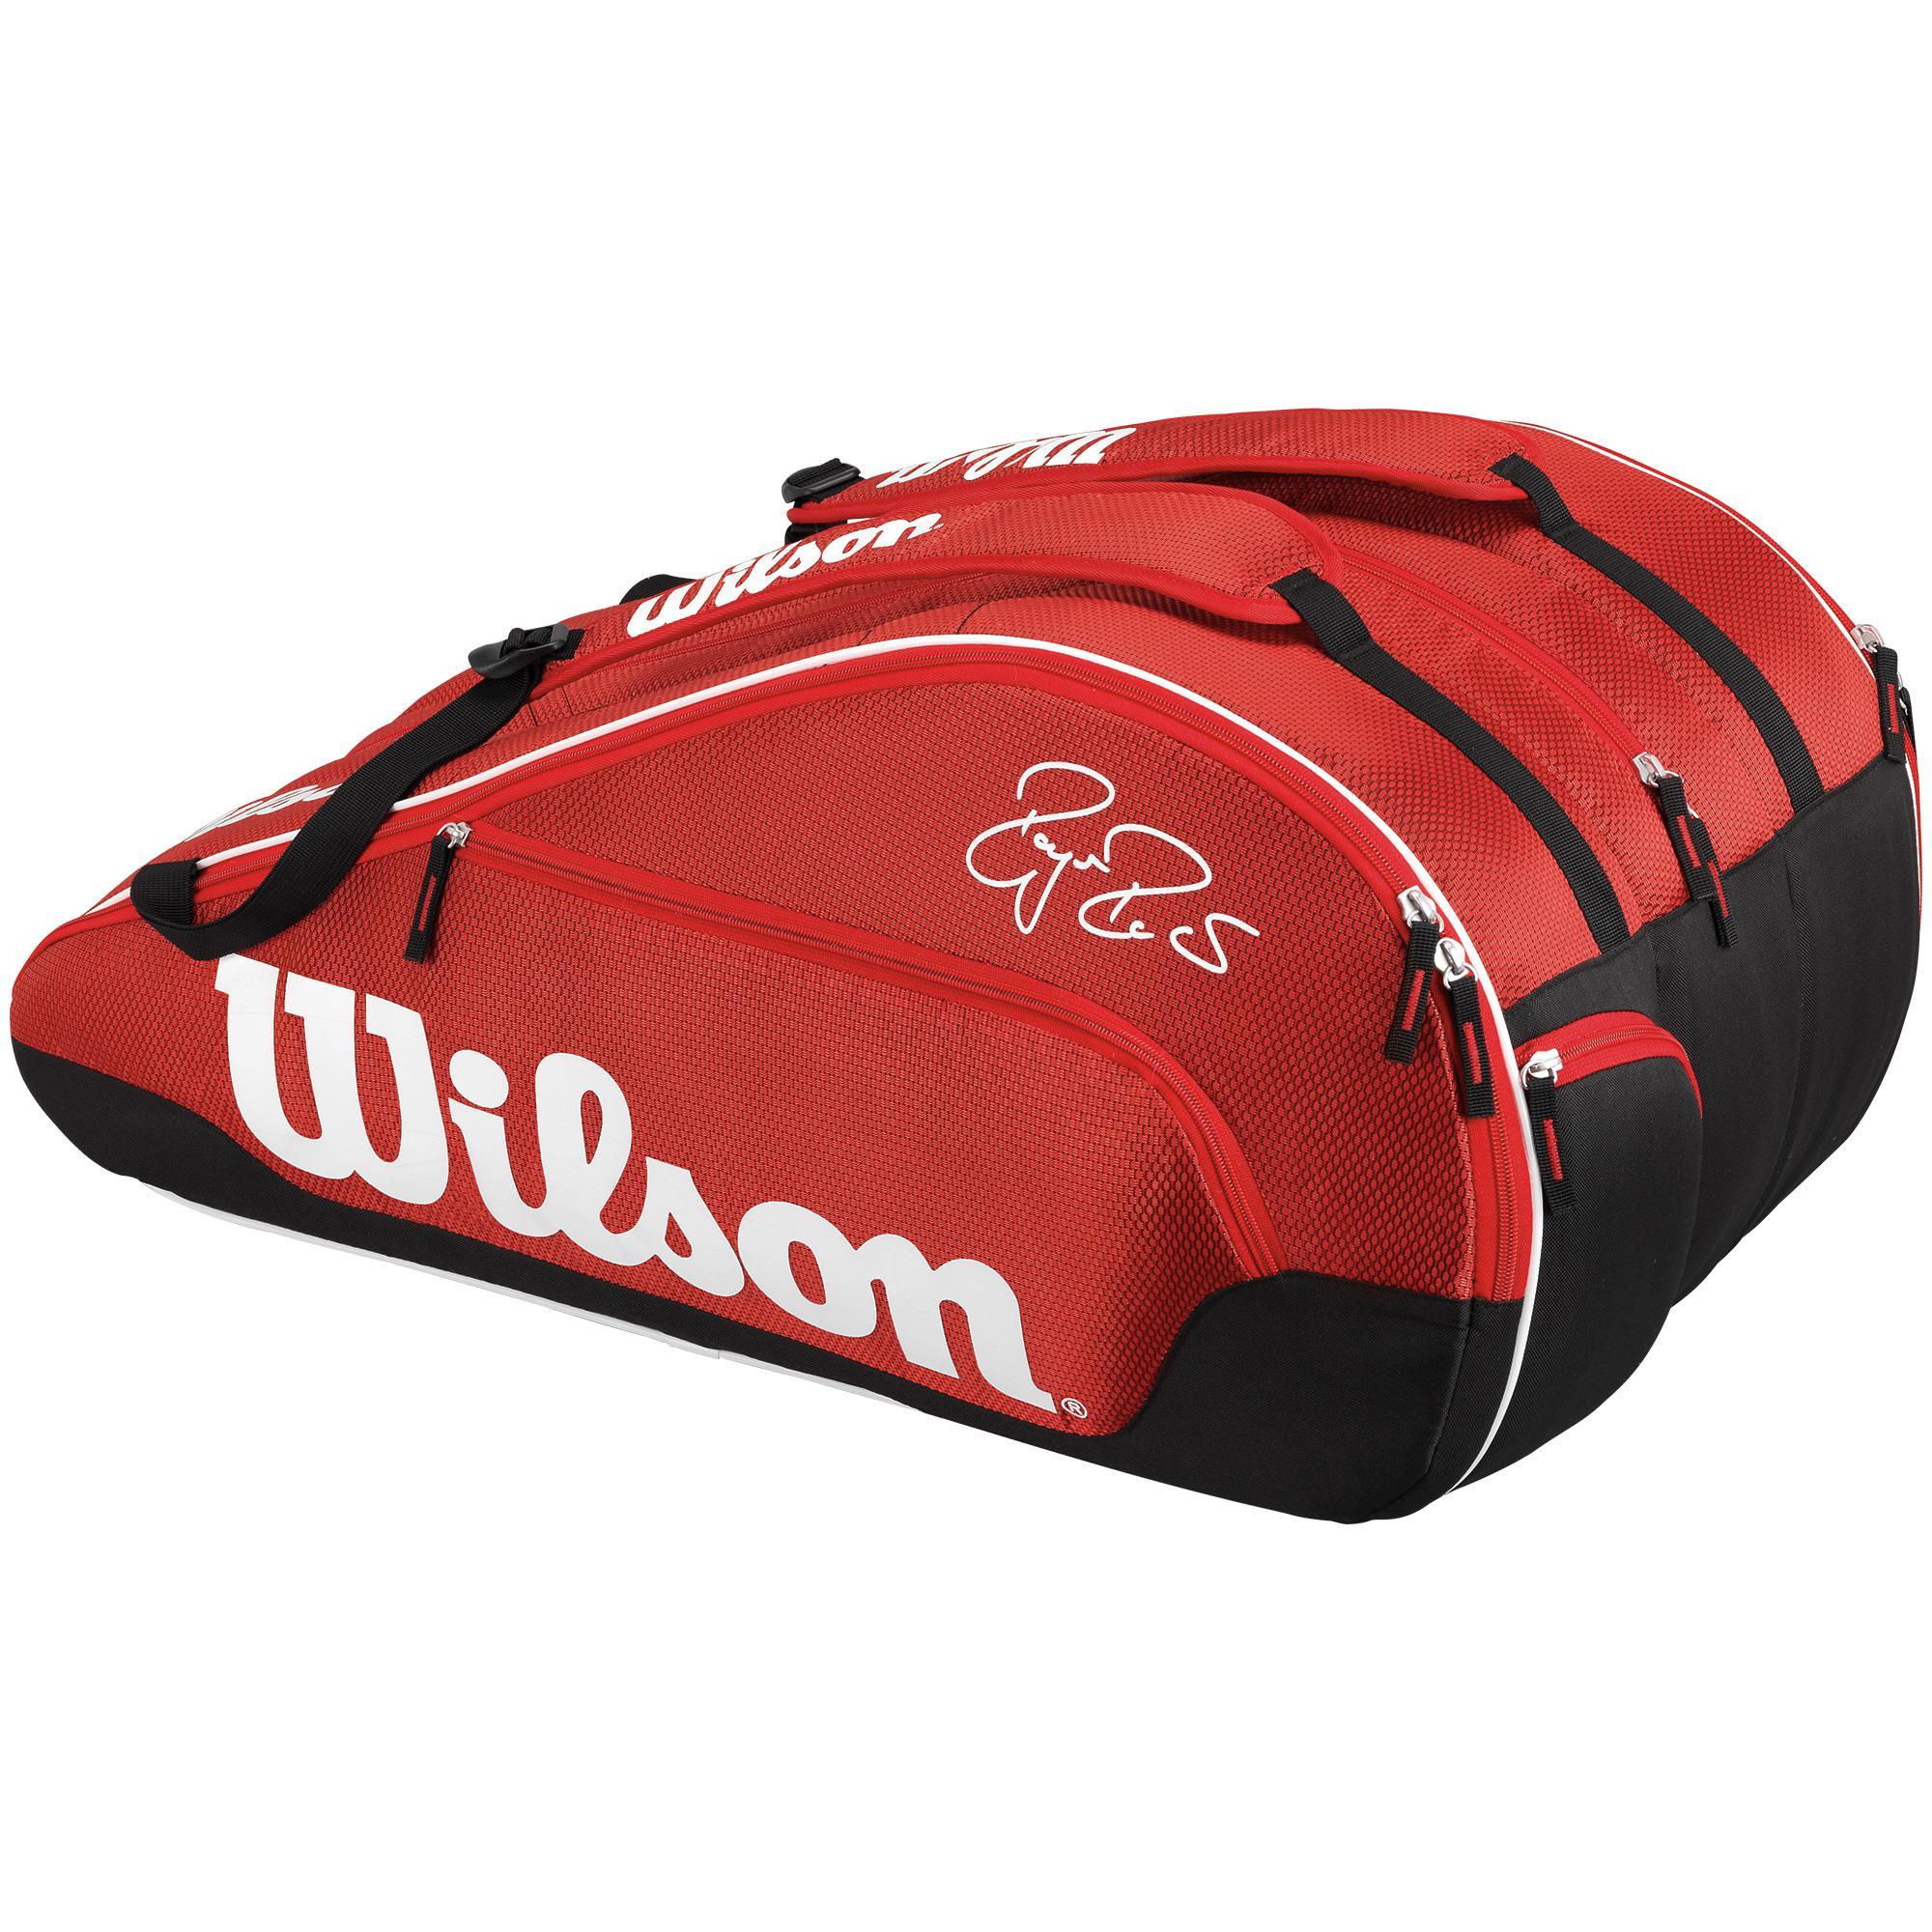 45897d49f04 Wilson Federer Team III 12 Pack Bag - Red - Tennisnuts.com